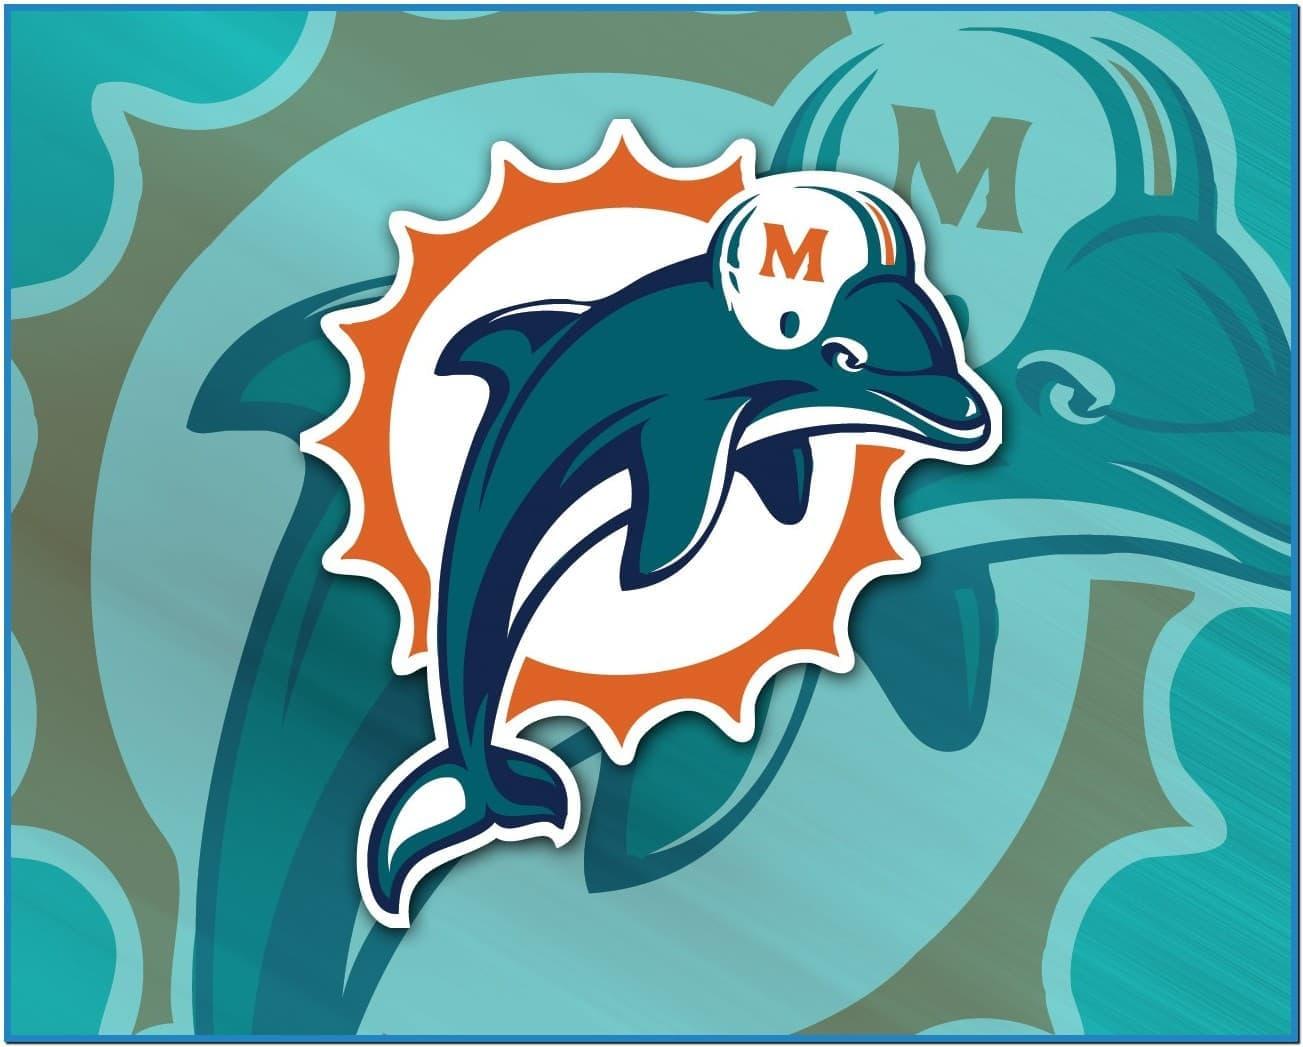 Miami dolphins screensaver wallpaper Download 1303x1047